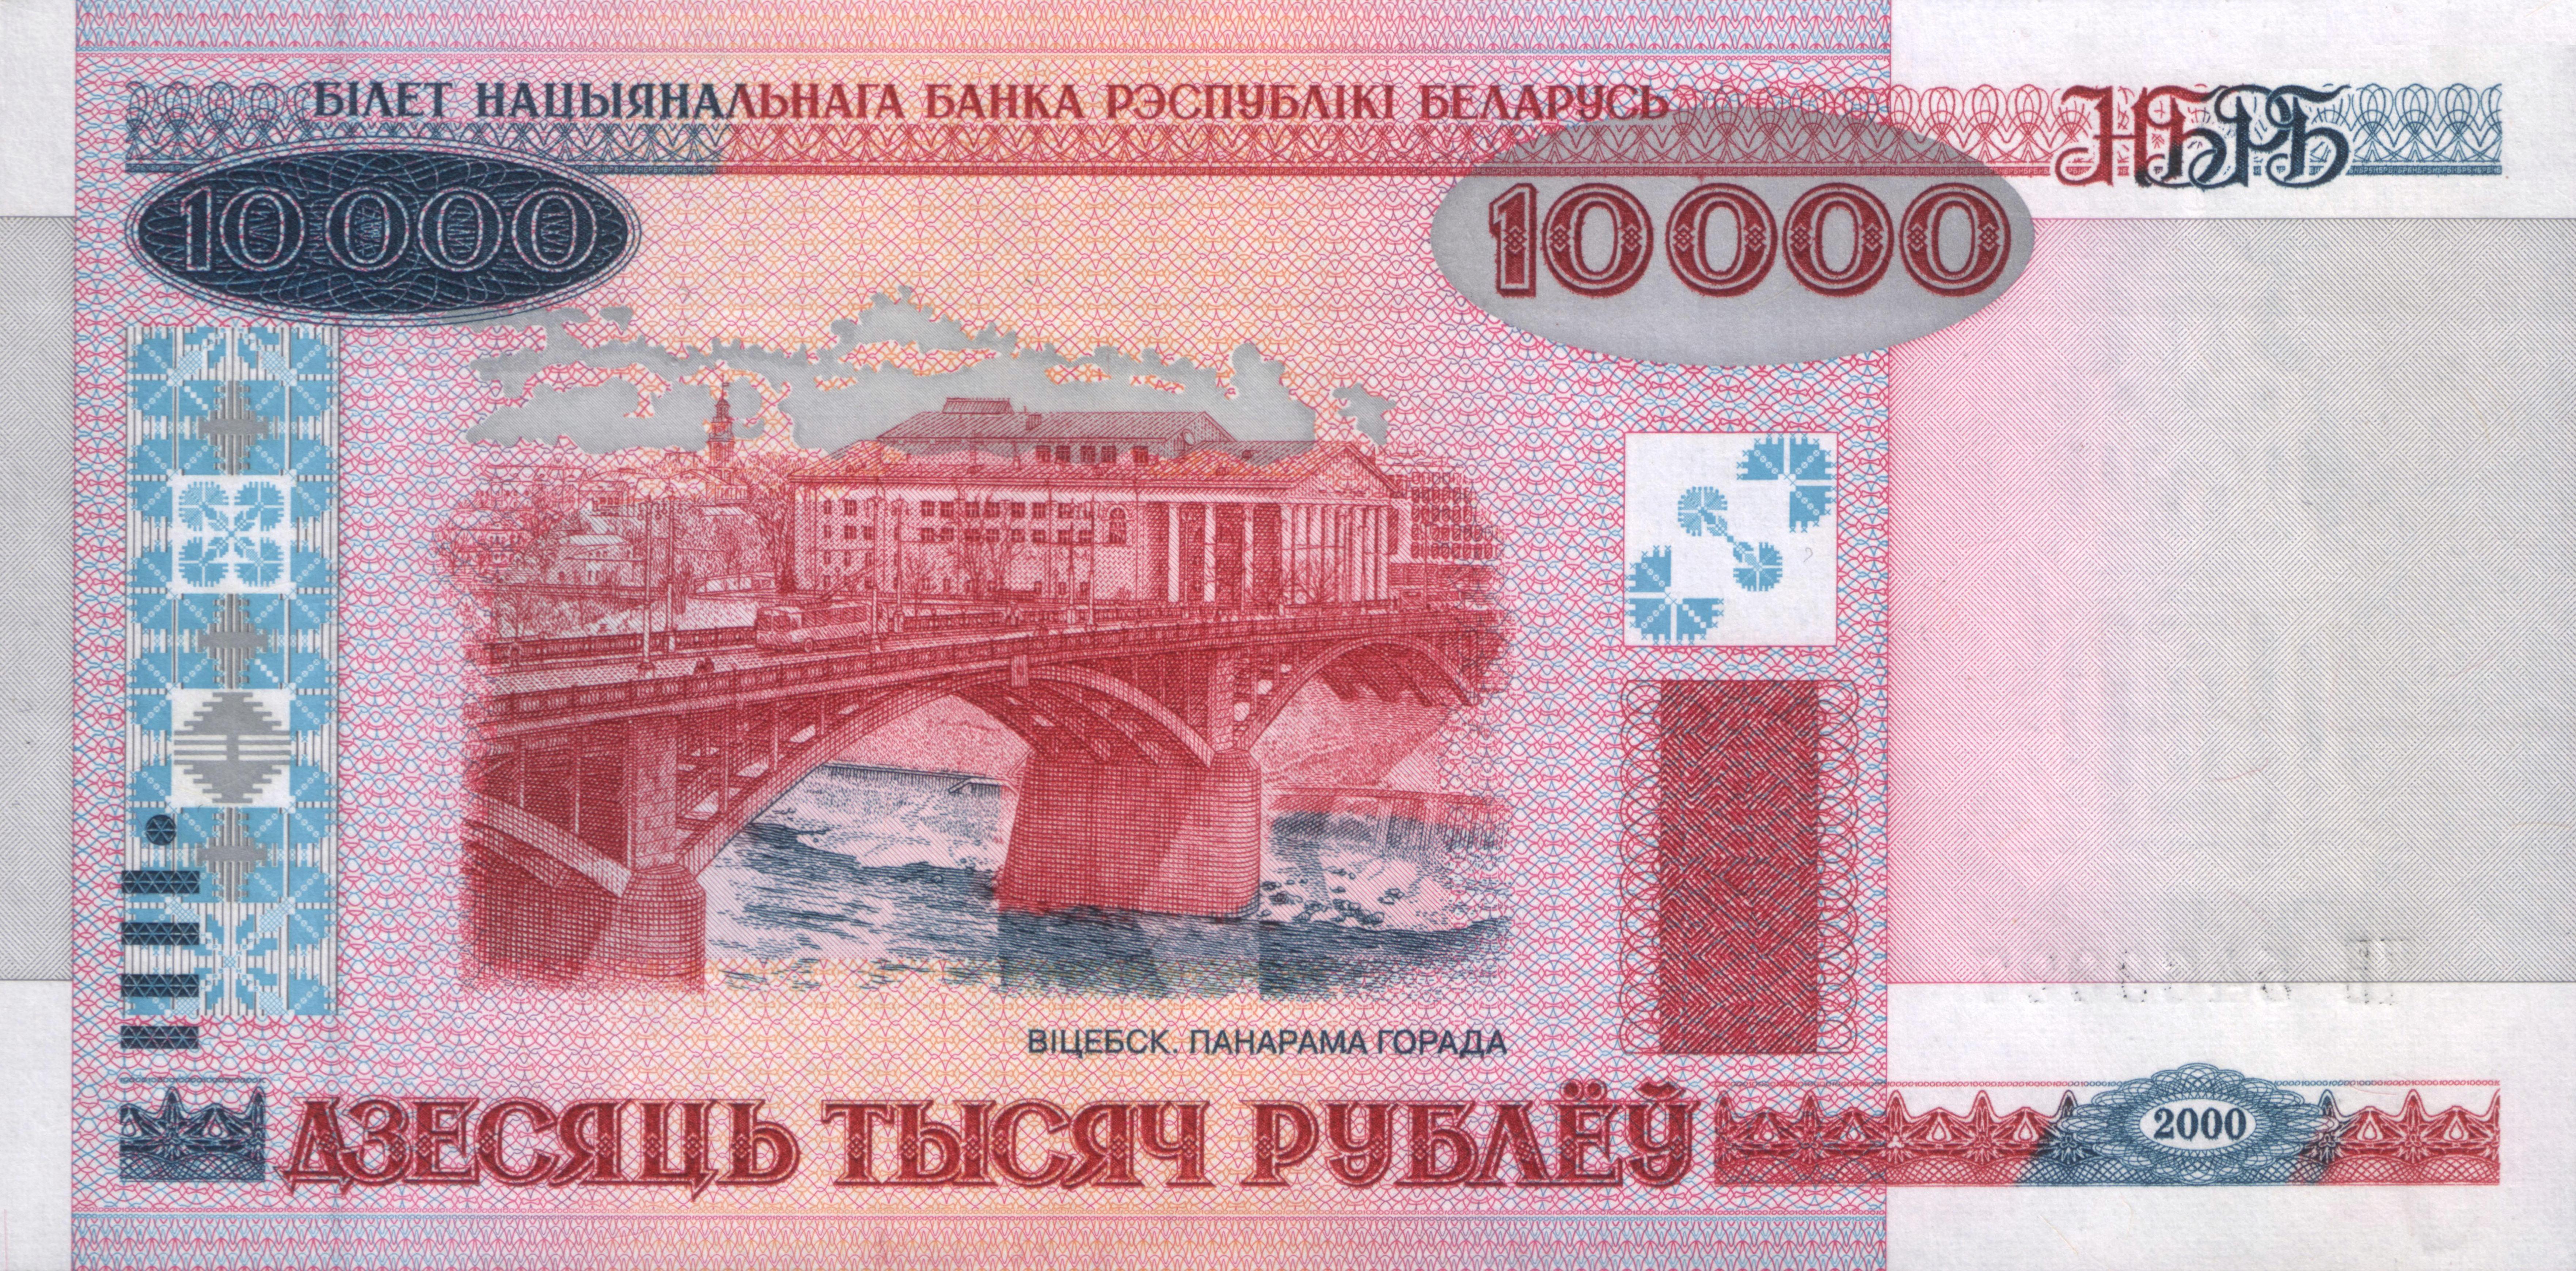 FN F2000  Wikipedia